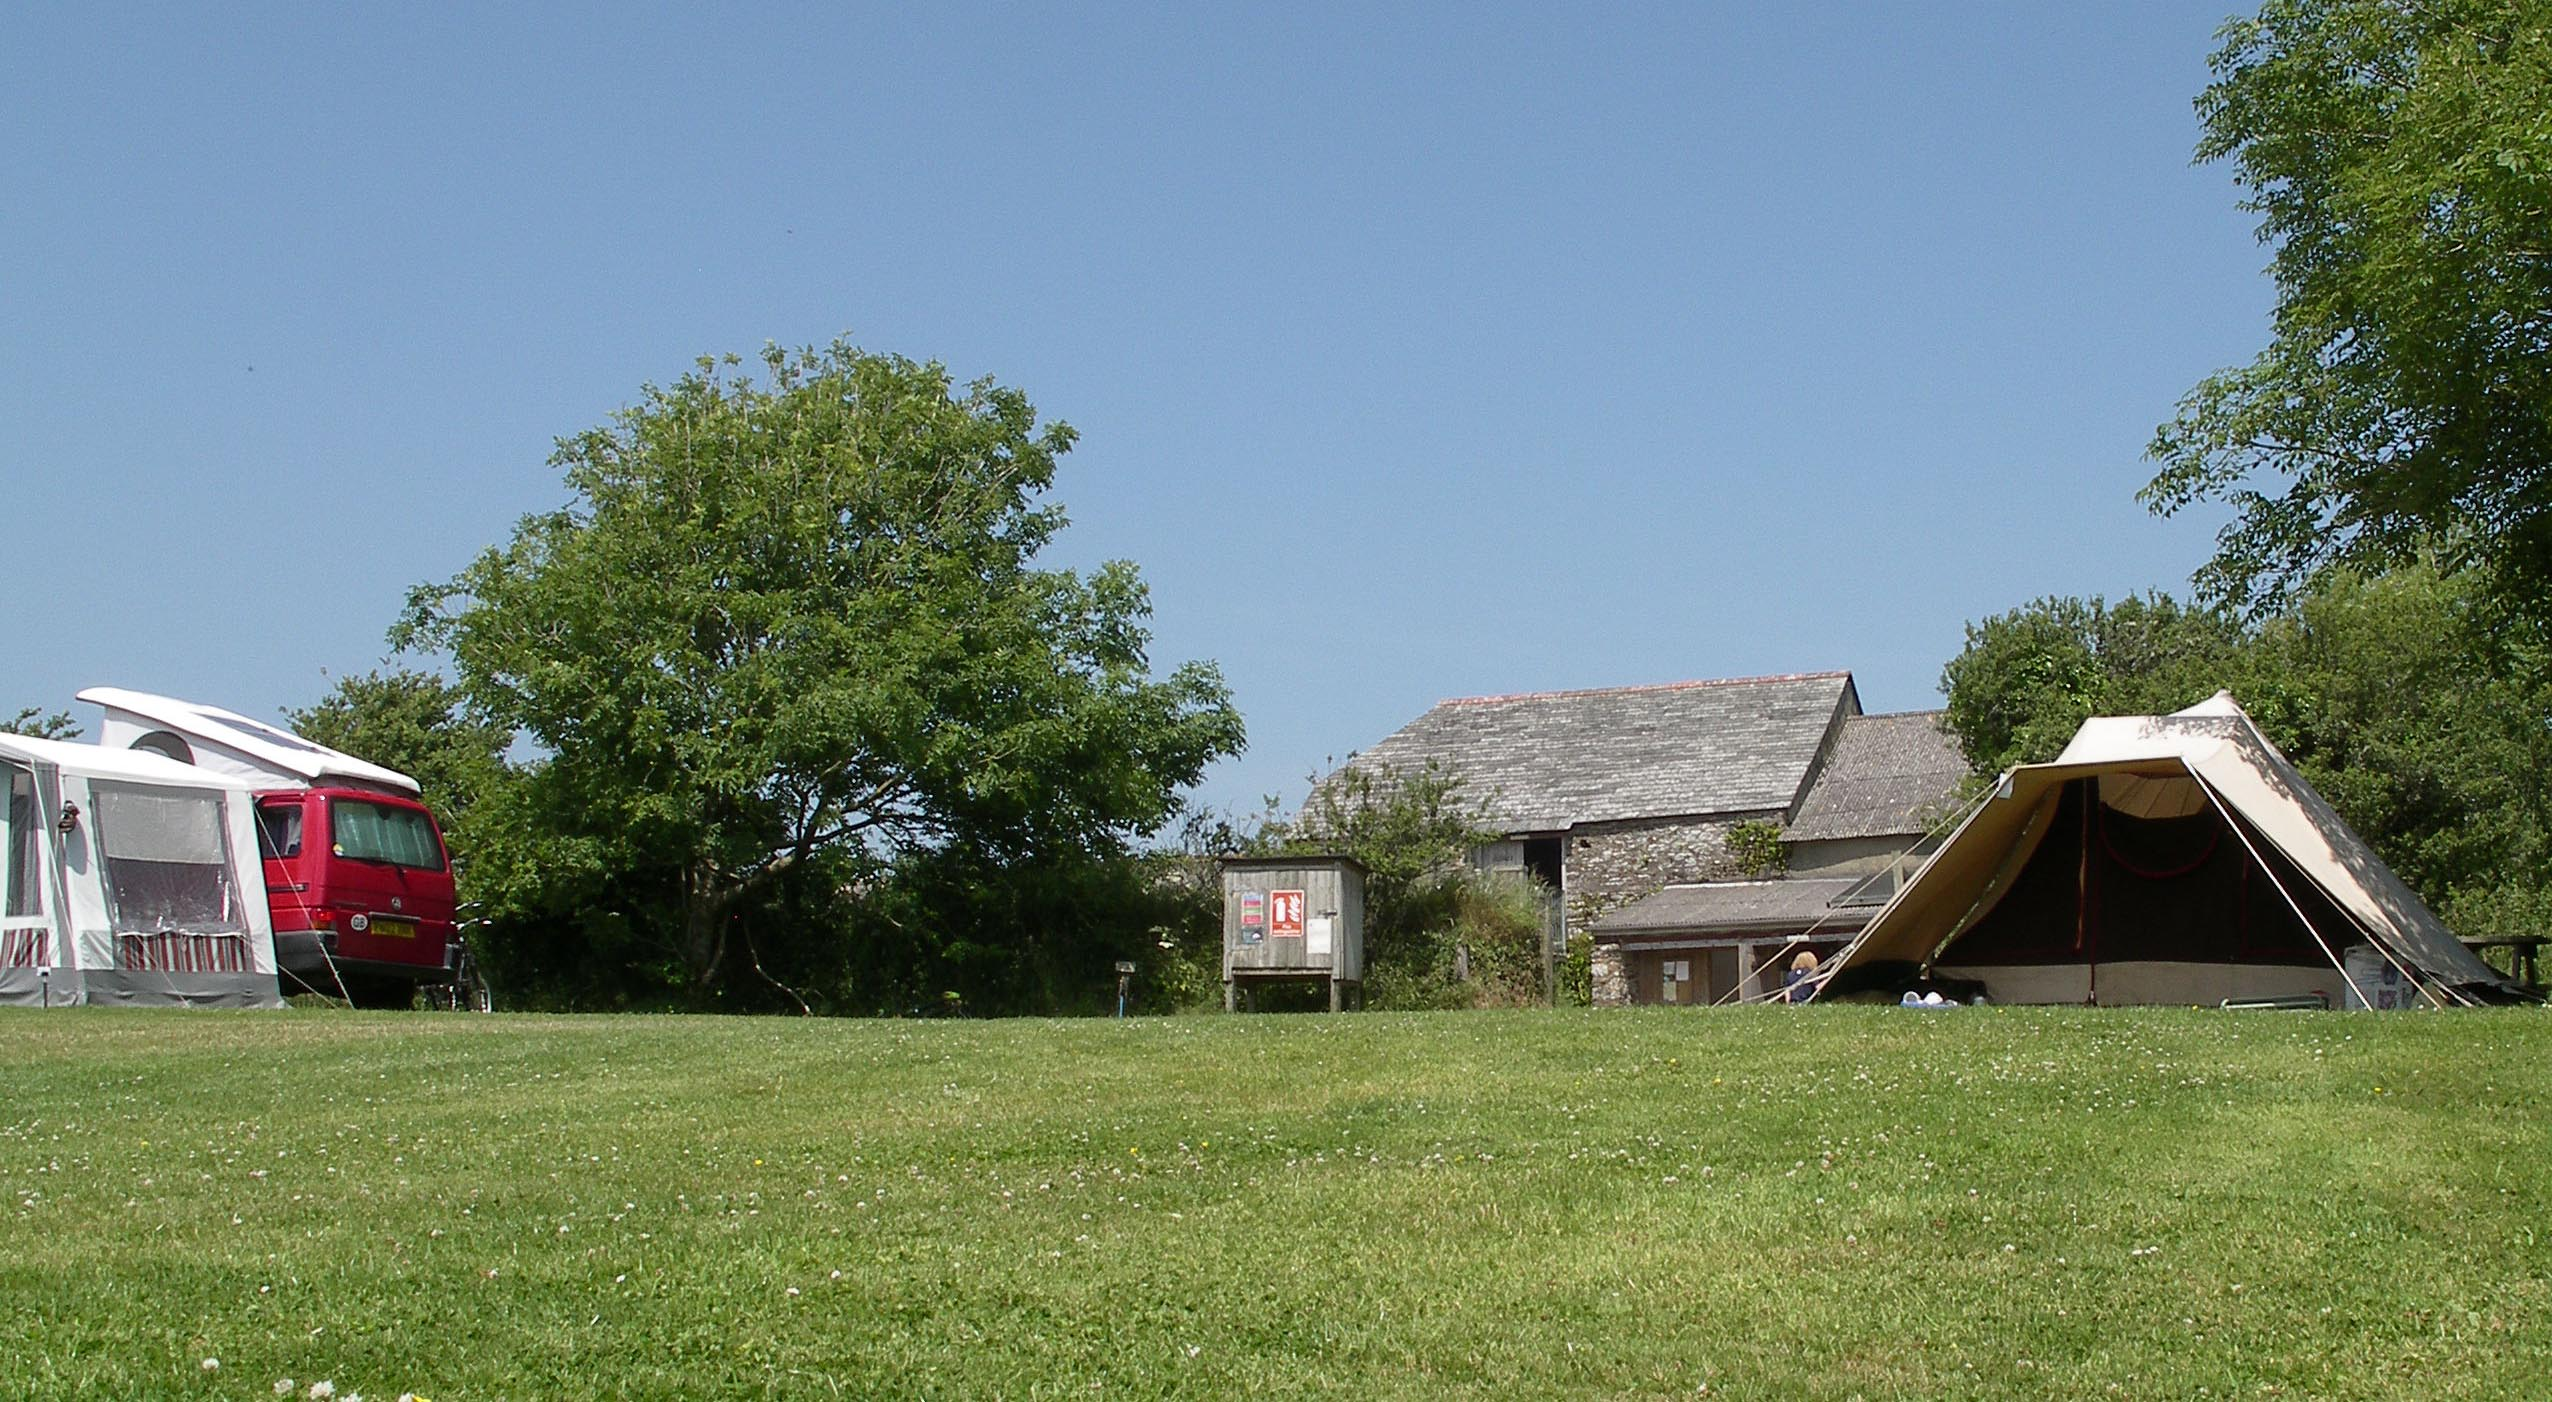 130712 highertown farm campsite 008crop